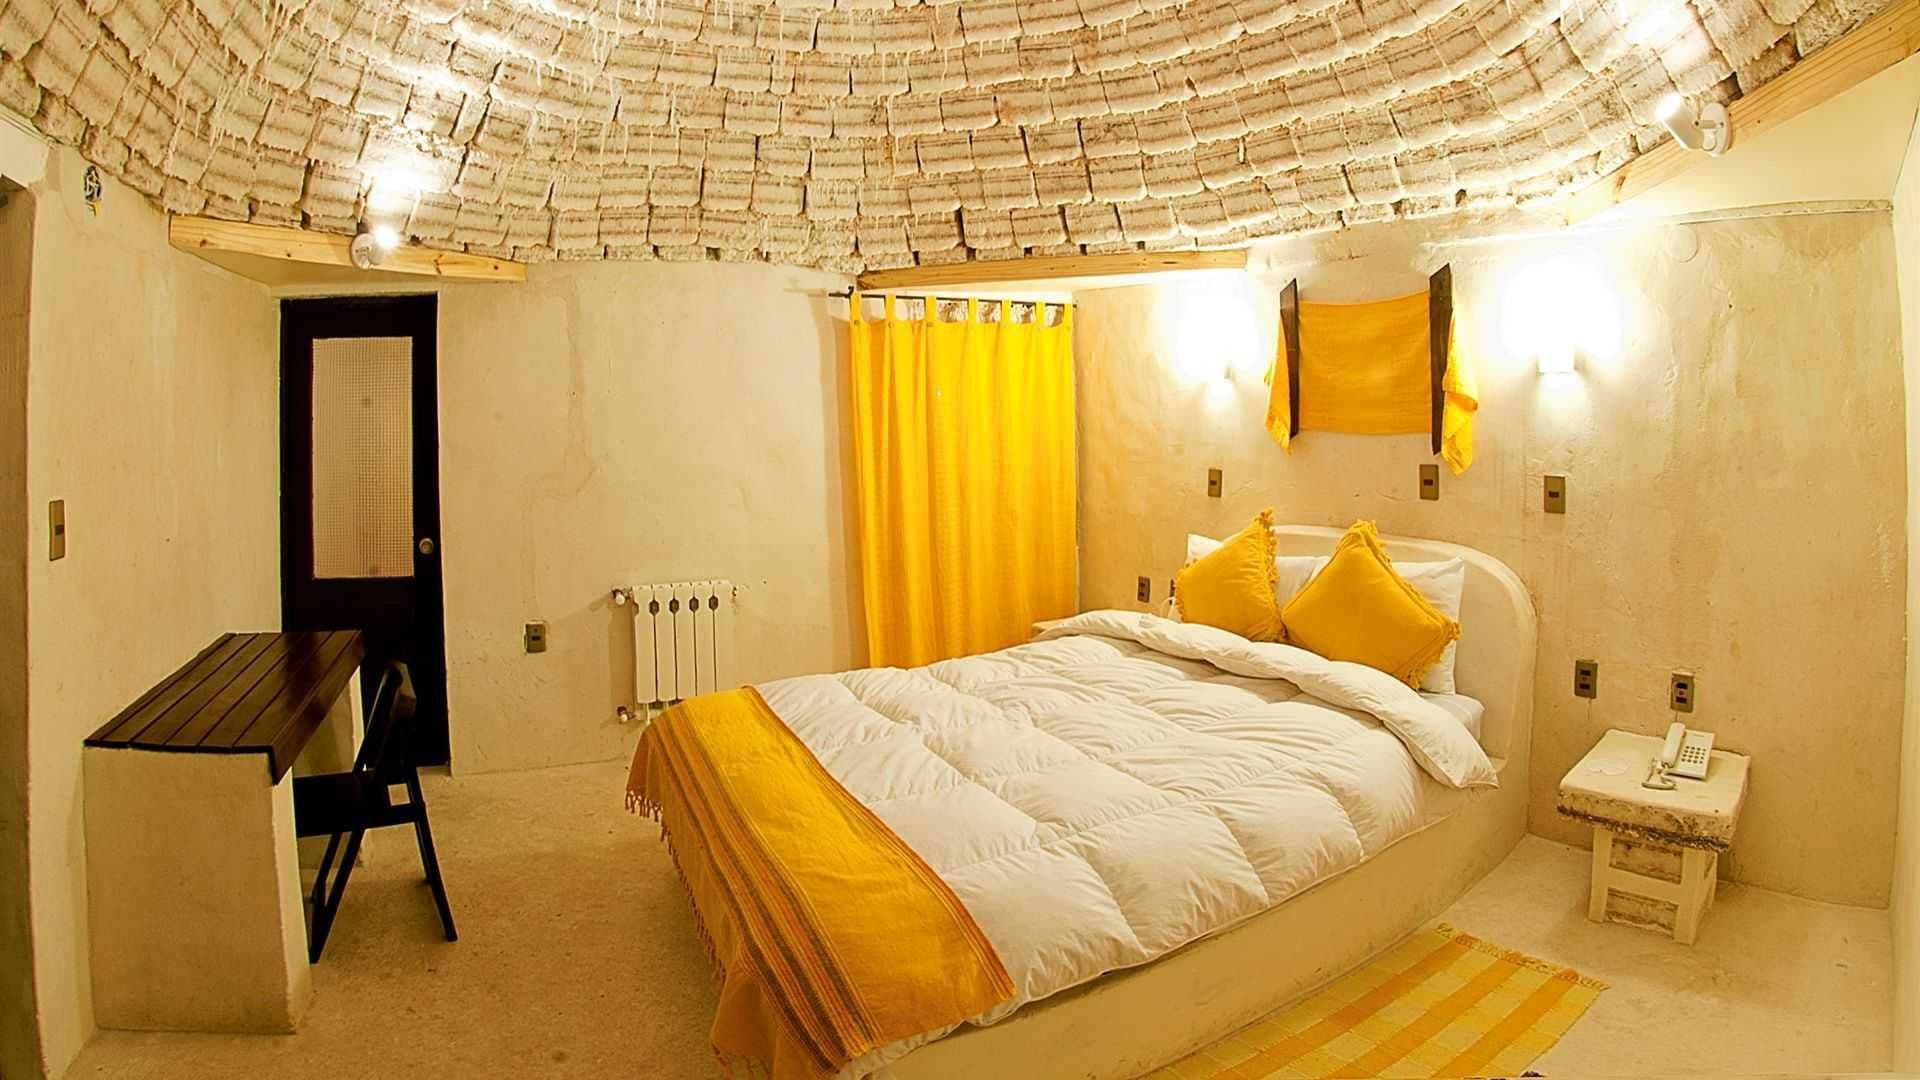 Palacio-de-Sal-resort-viaggio-di-nozze-Bolivia-1